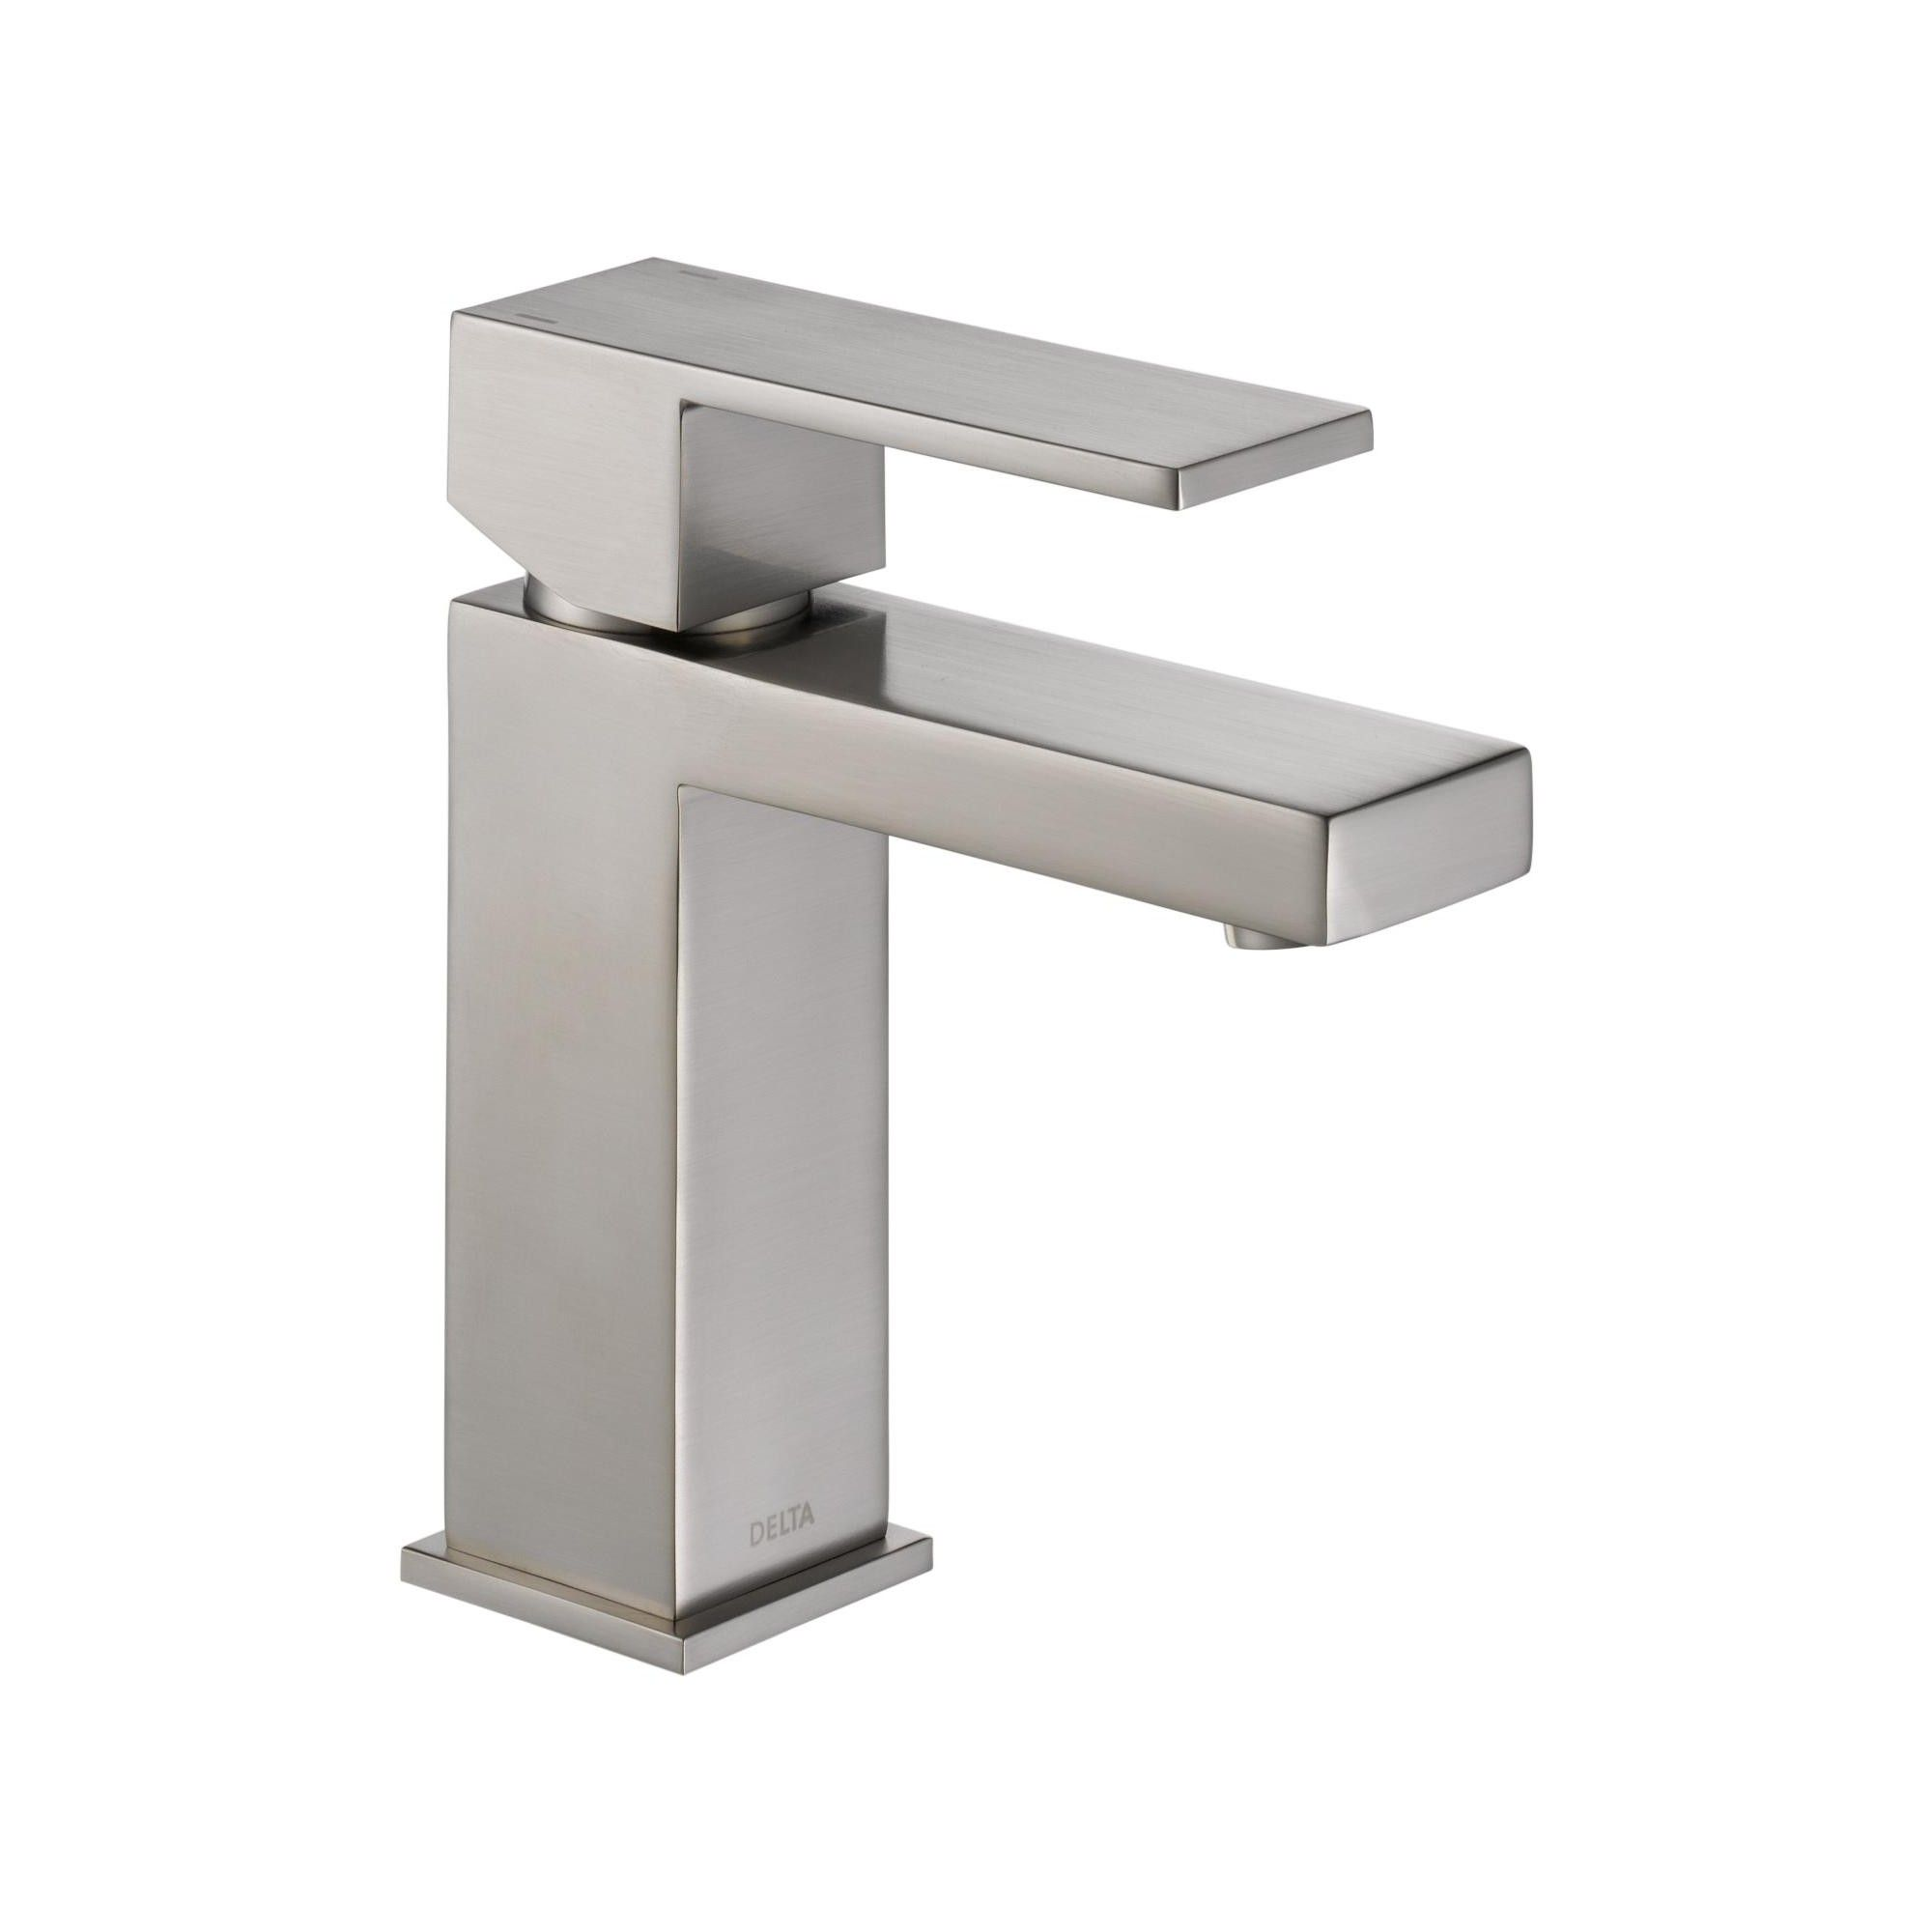 Delta Faucet 567lf Pp Angular Modern Single Hole Bathroom Faucet